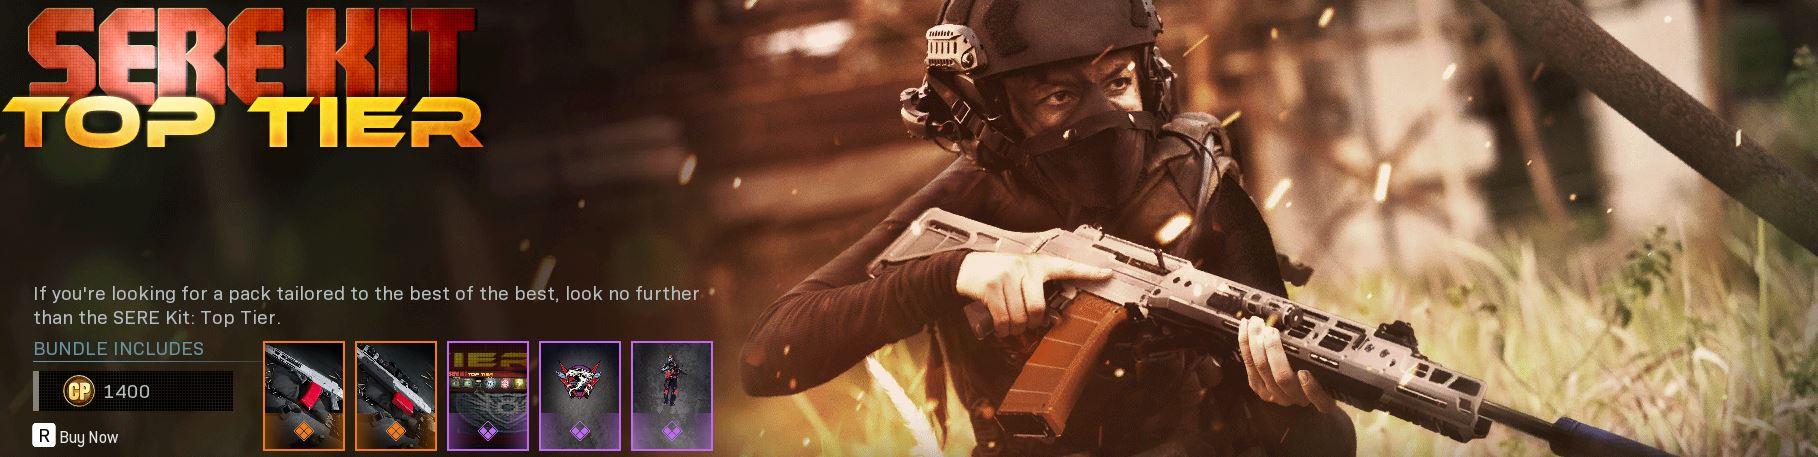 SERE Kit Top Tier bundle banner